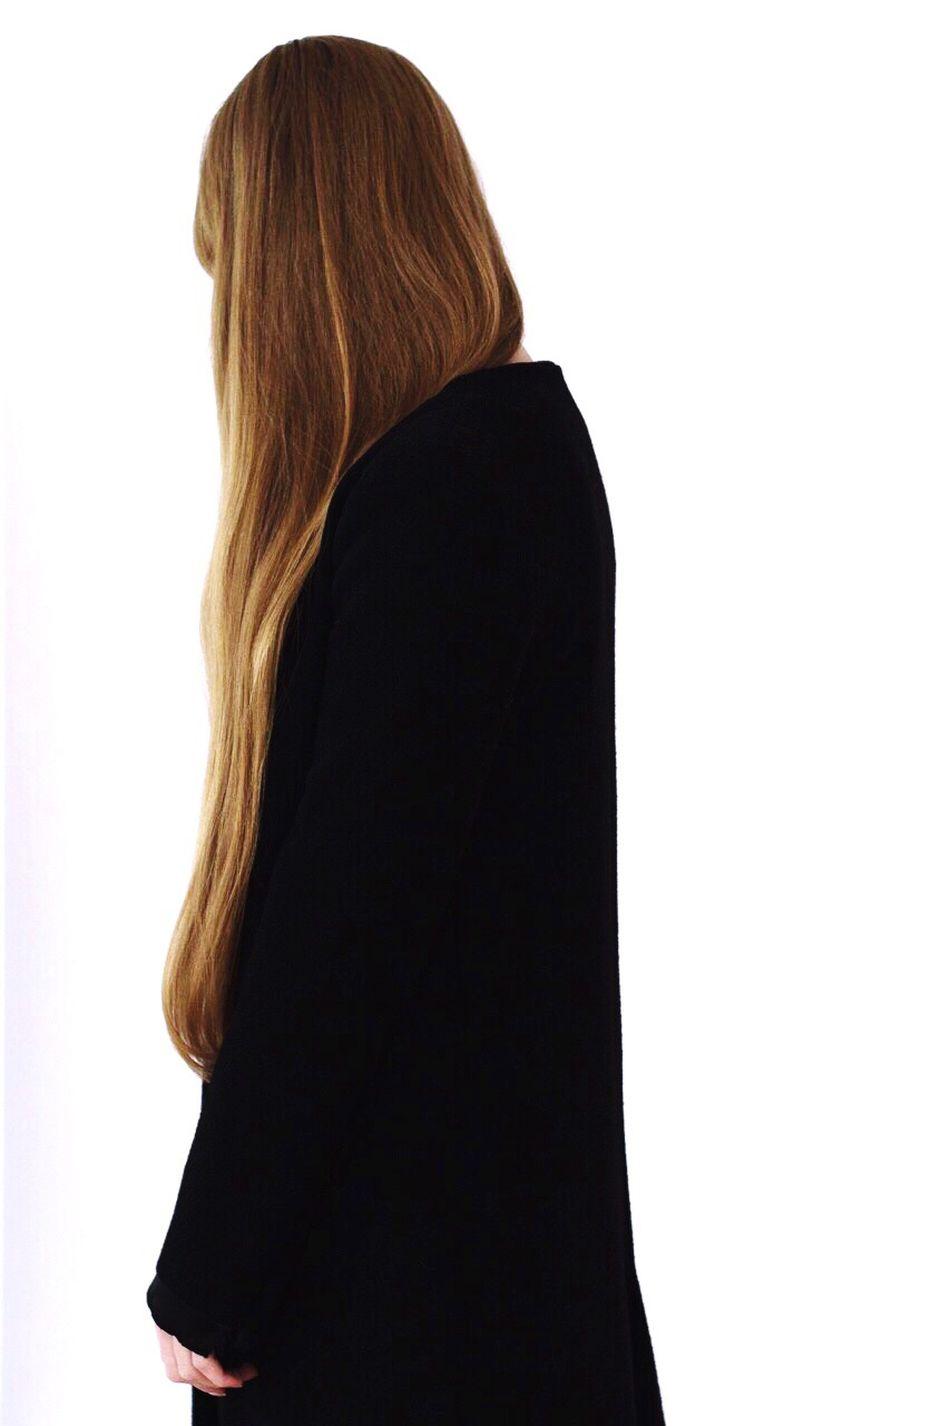 Beautiful stock photos of fashion, rear view, long hair, studio shot, one woman only